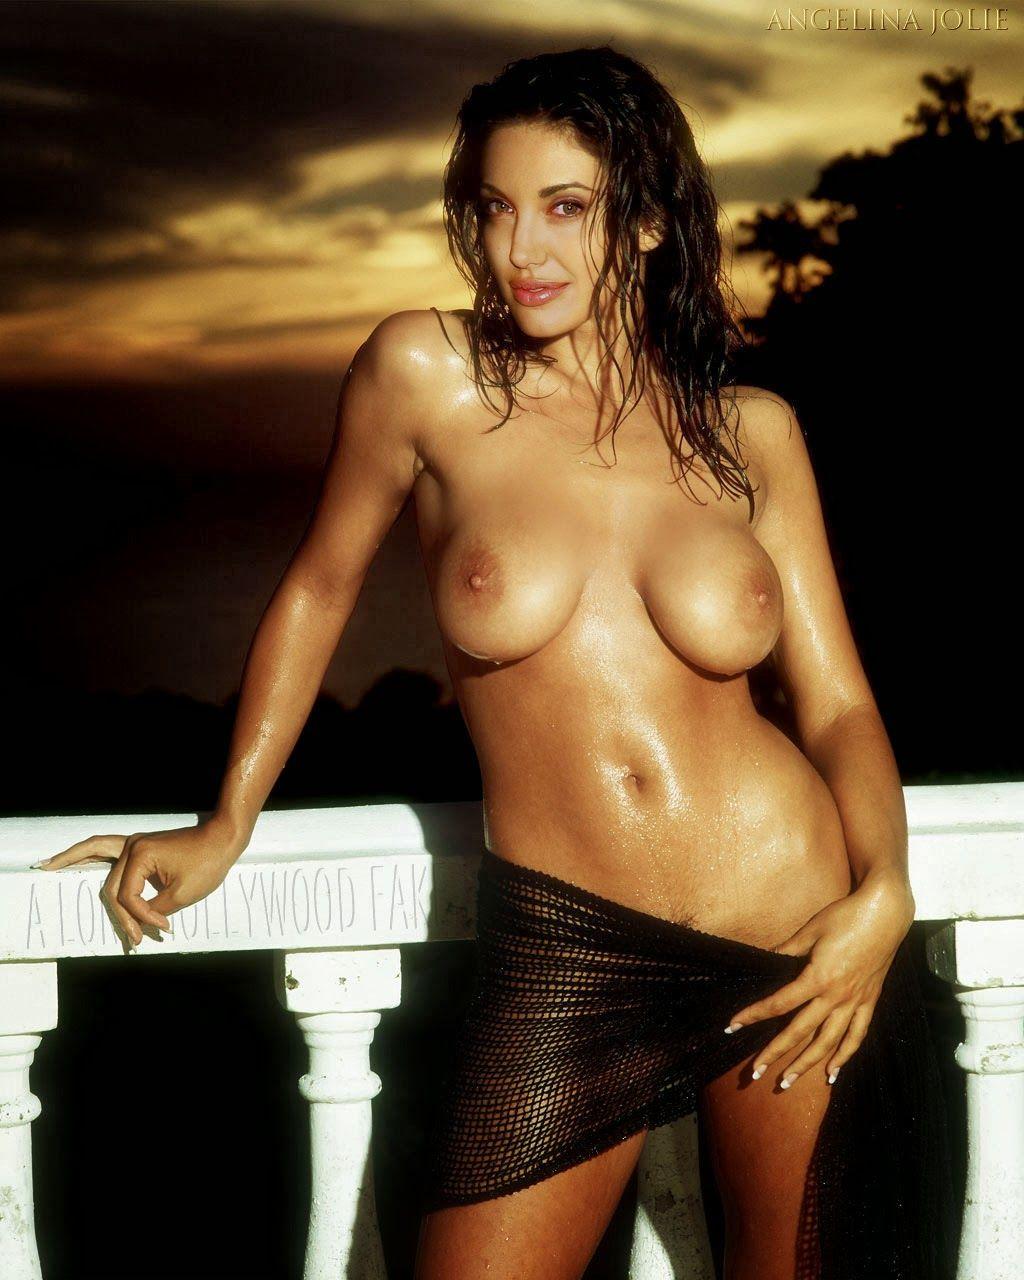 Angelina Jolie Sex Porn angelina jolie nude sex real photos . 30 new sex pics